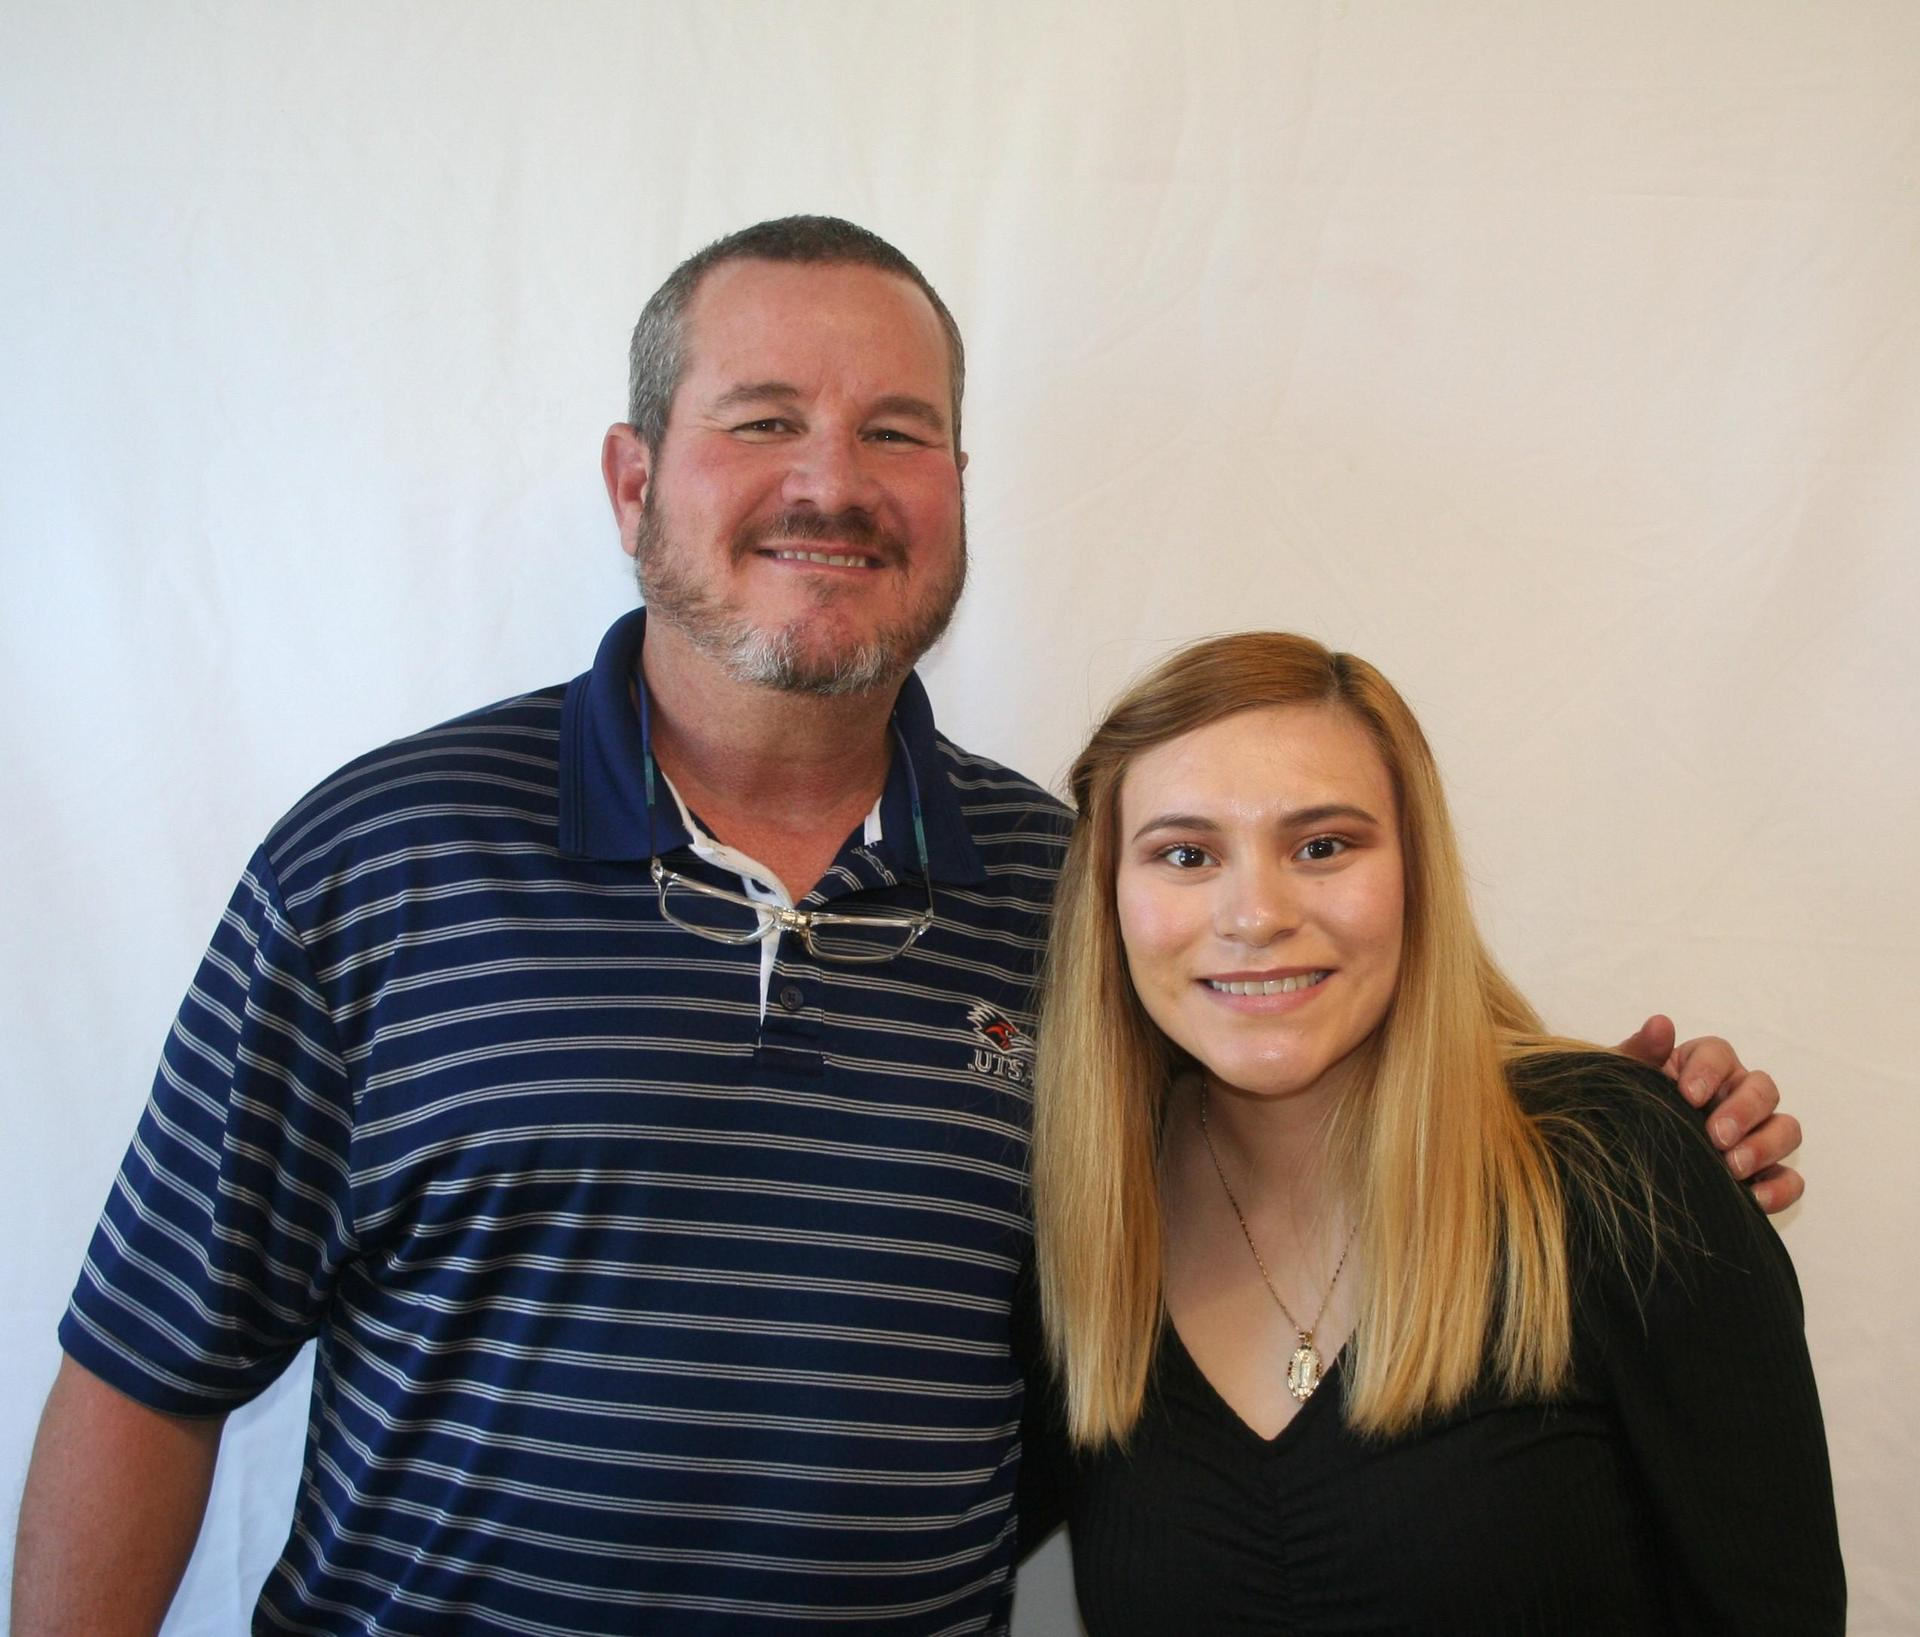 Mr. Payne and Lisbeth Neri